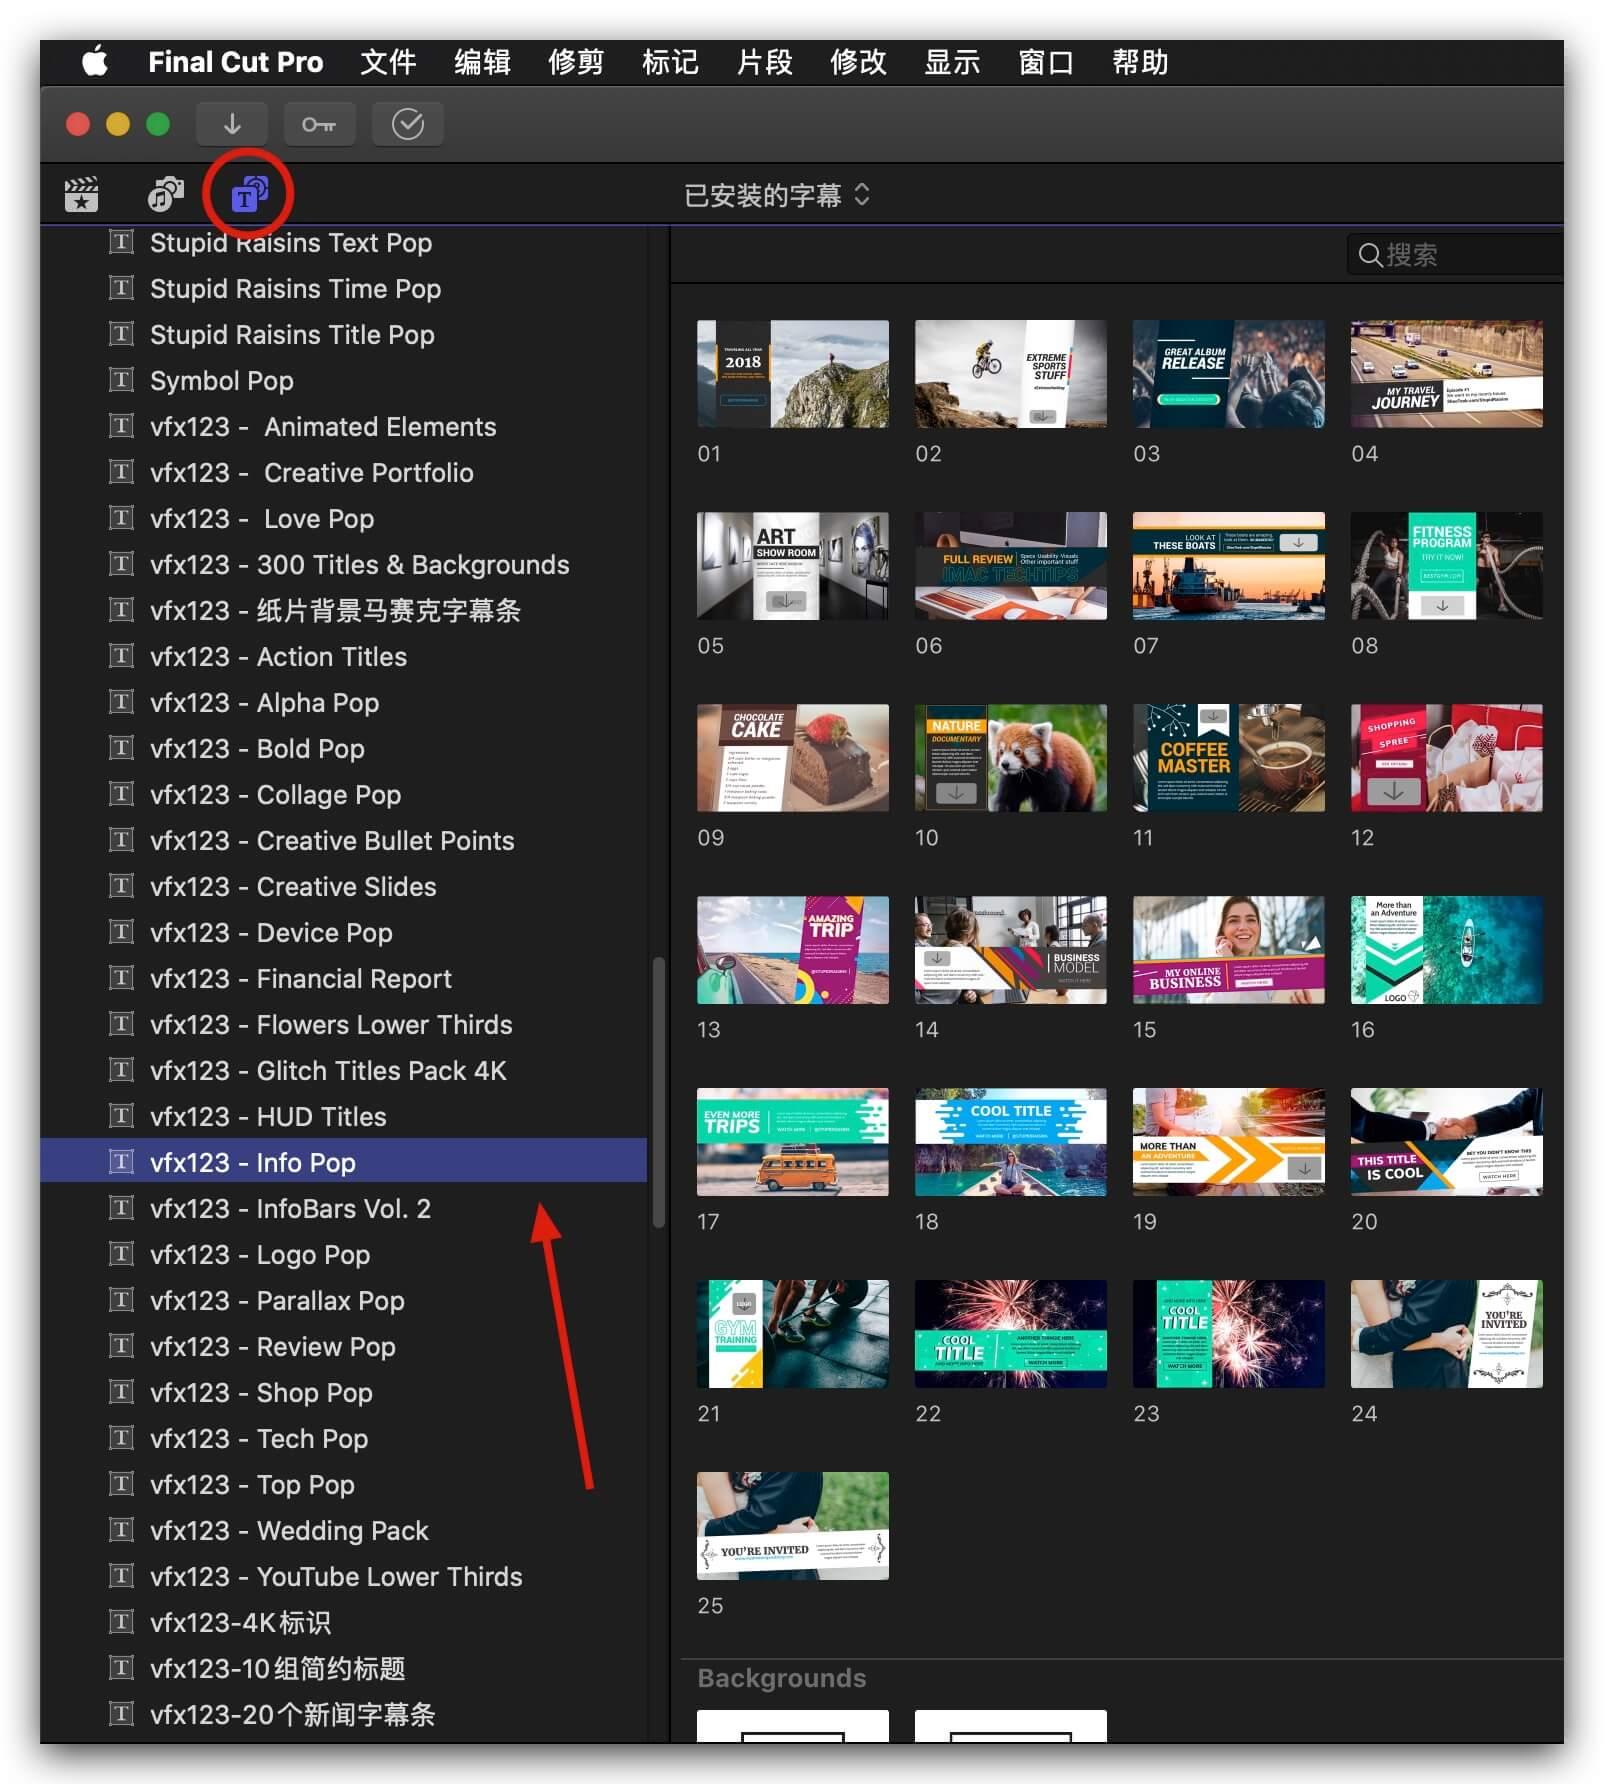 fcpx插件 25组信息栏前景文字版式标题动画模板 支持M1 Info Pop